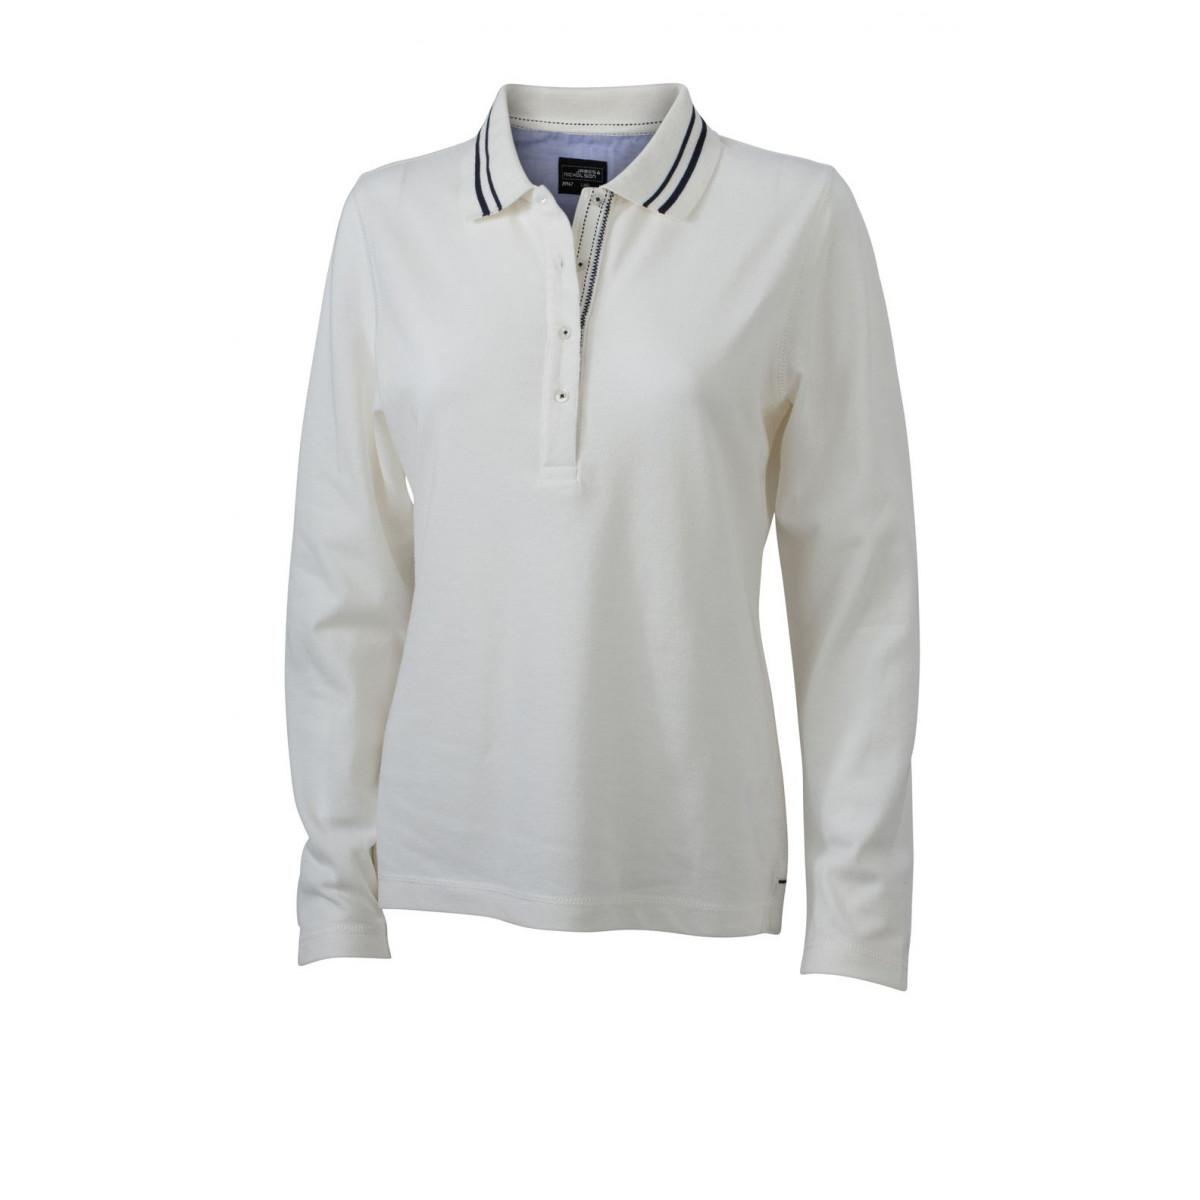 Рубашка поло женская JN967 Ladies Polo Long-Sleeved - Белый/Темно-синий